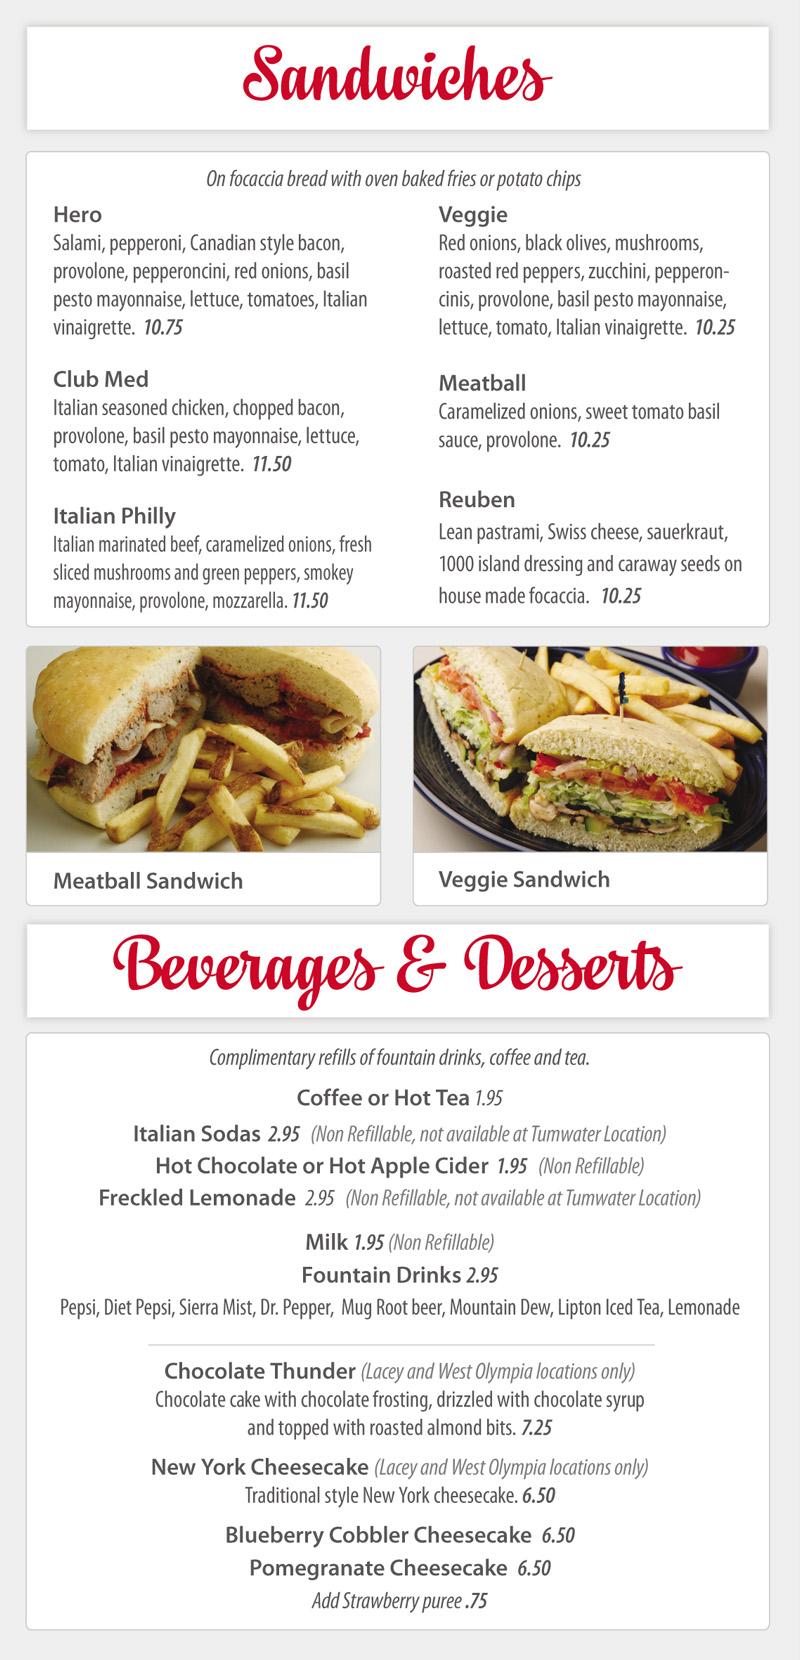 Sandwiches, Beverages and Dessert